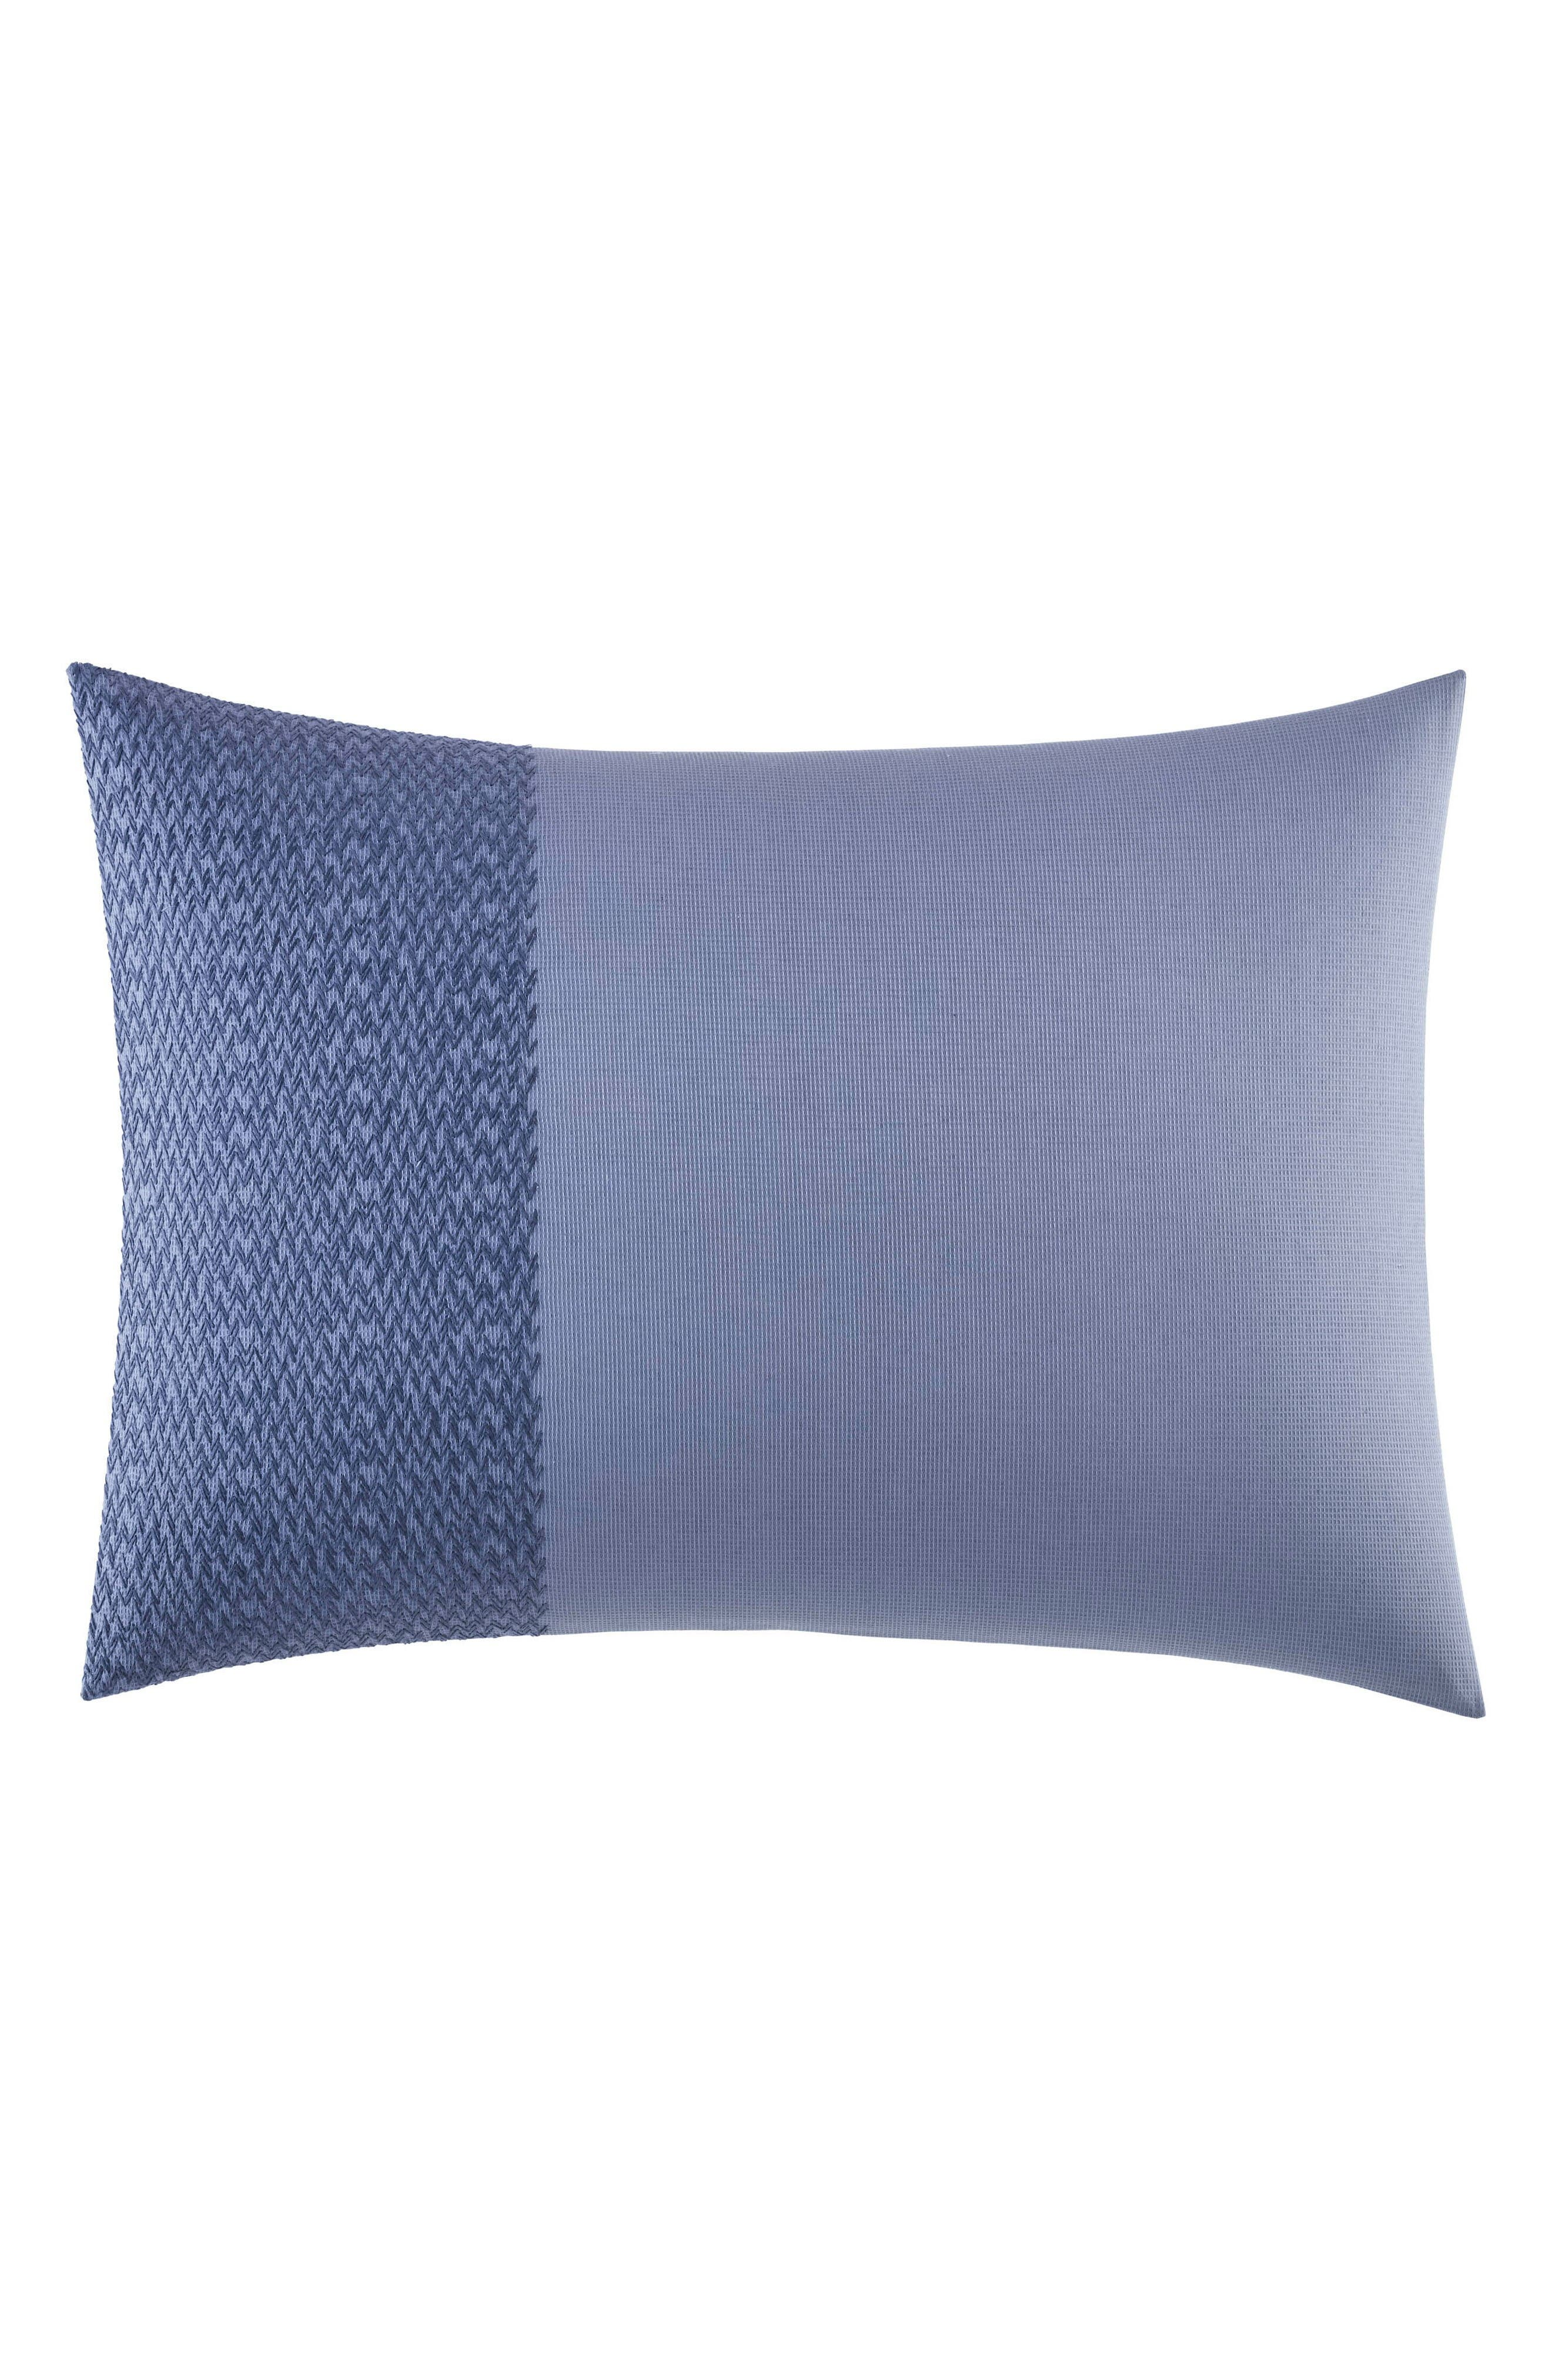 Main Image - Vera Wang Chevron Breakfast Pillow